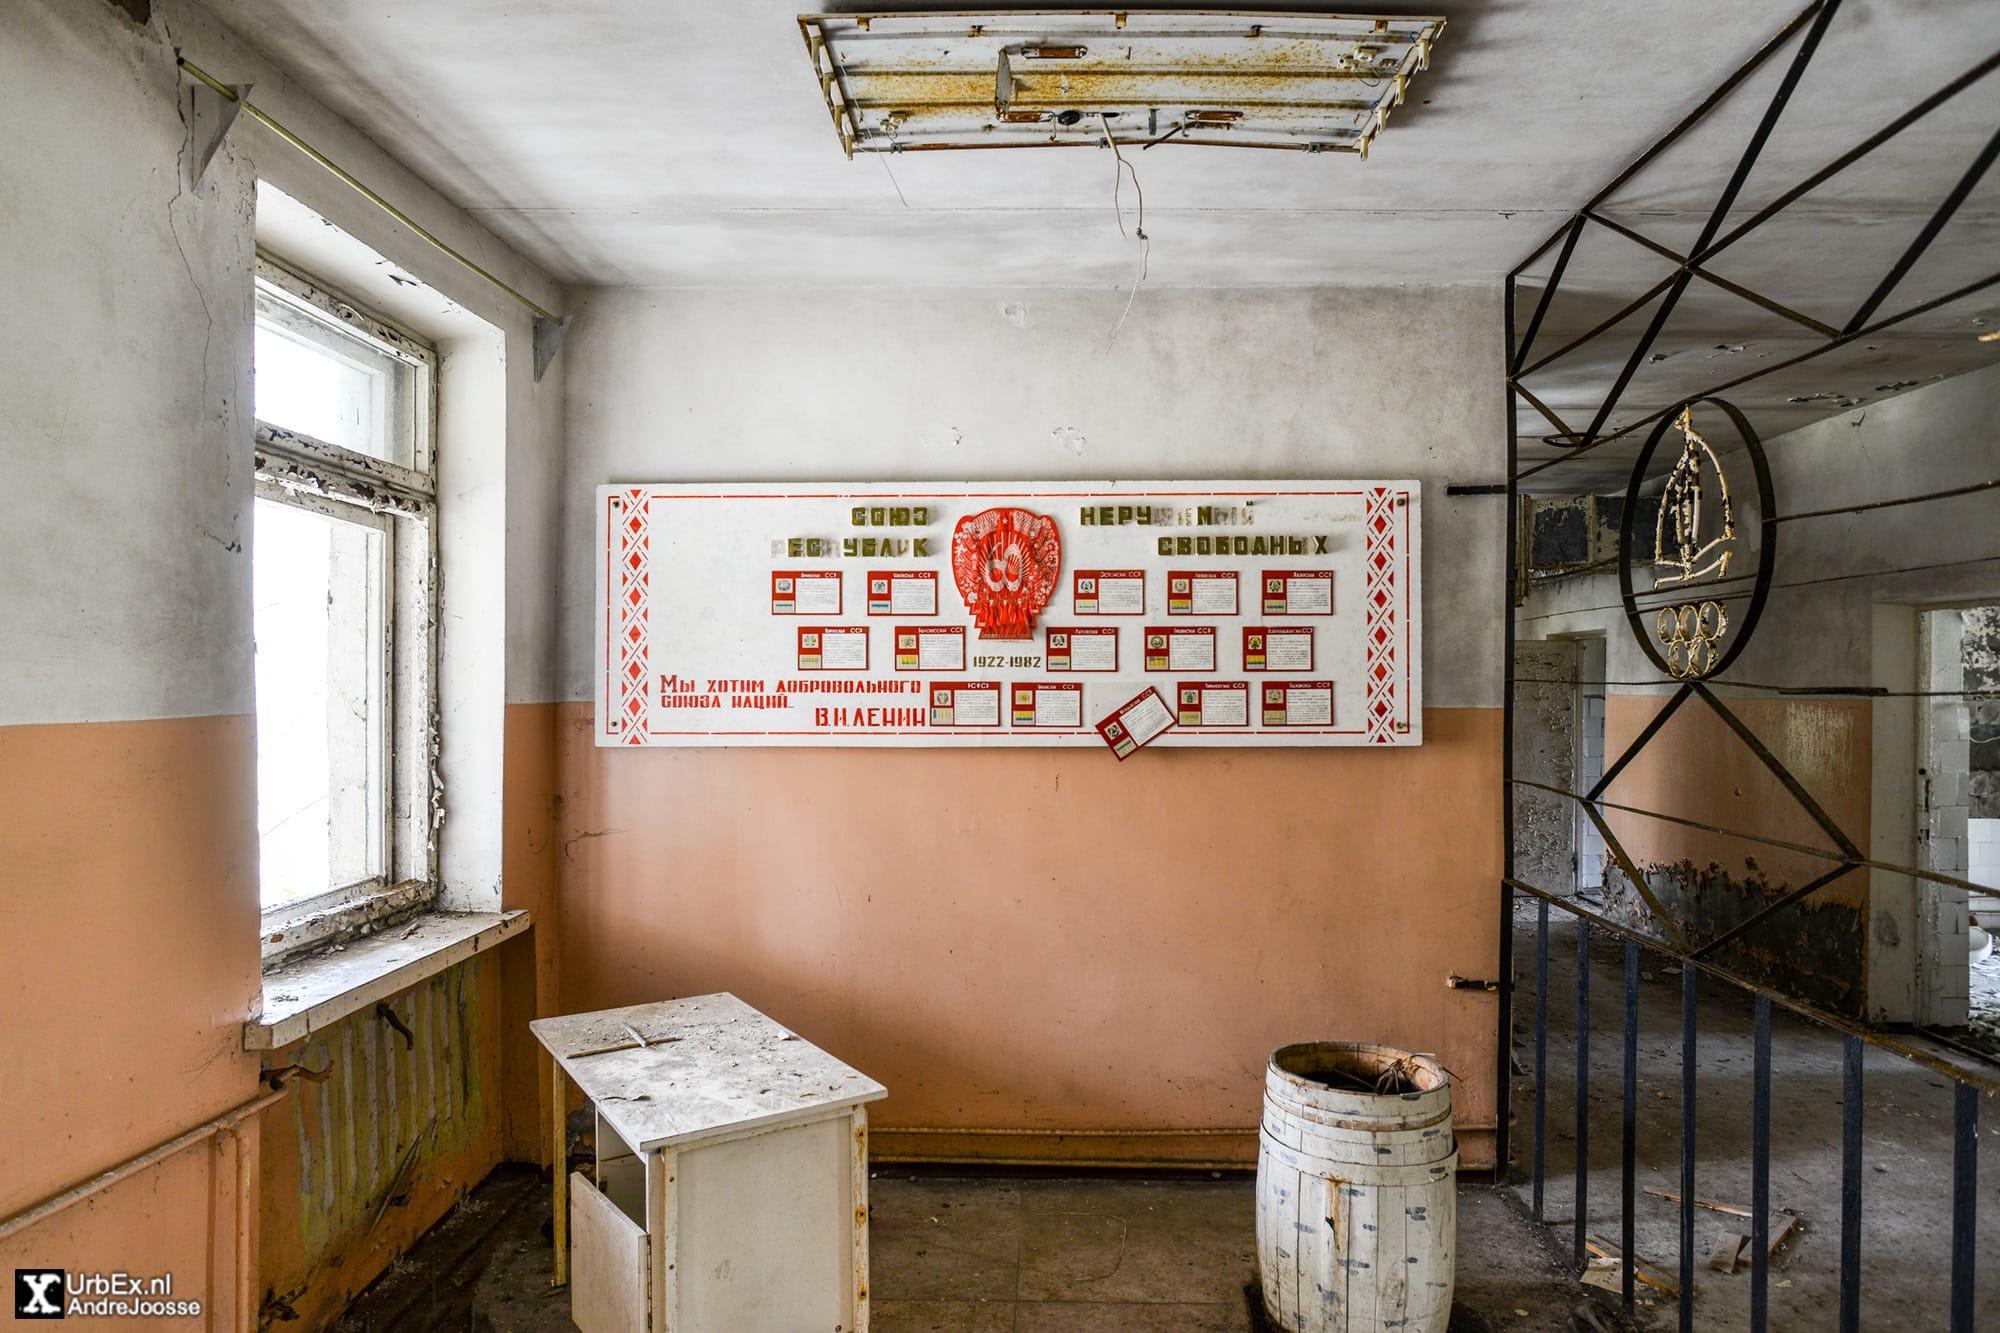 Chernobyl-2 Clinic